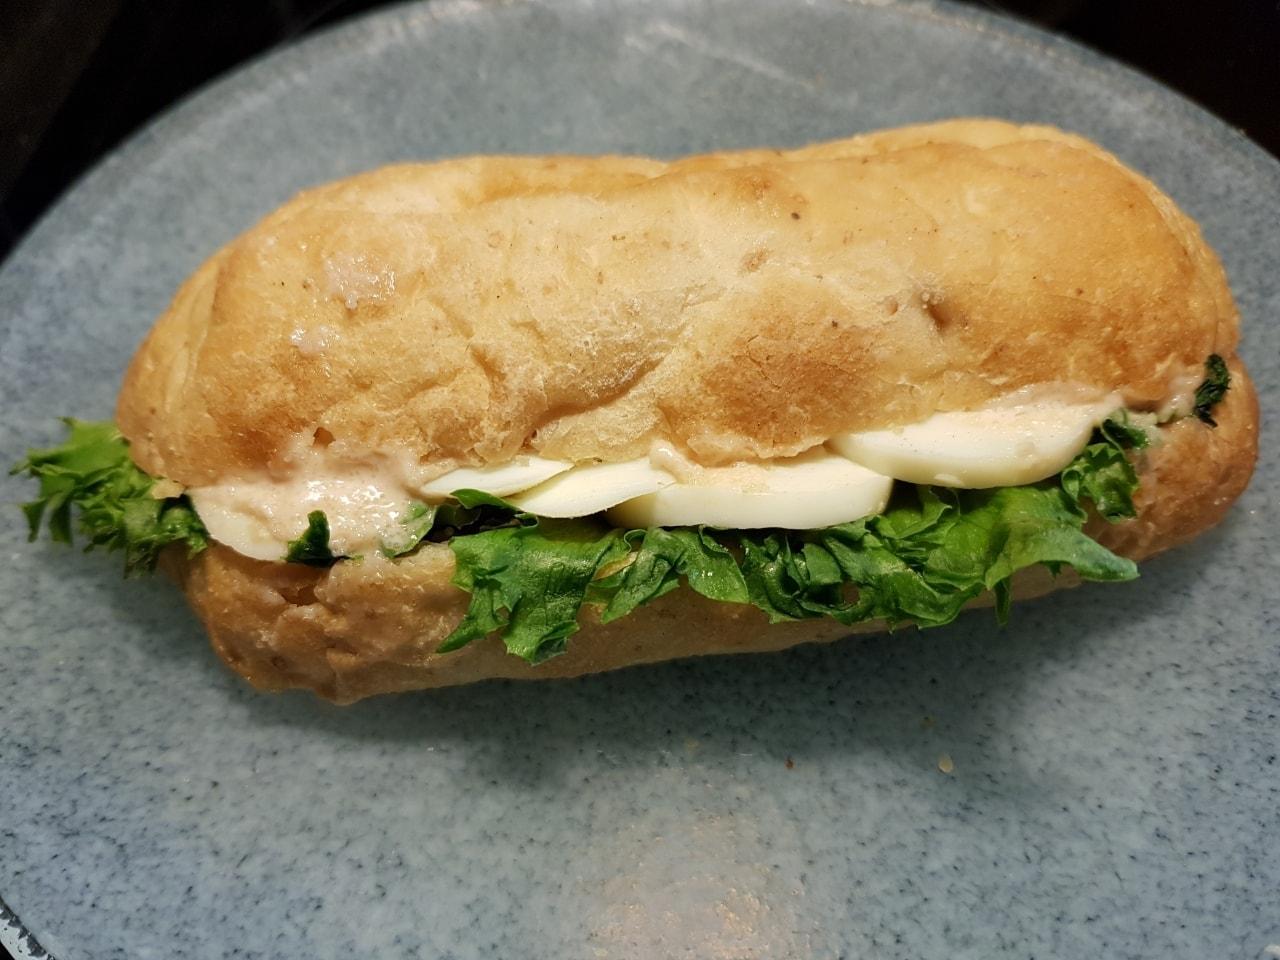 Egg sandwich from Caffe Nero Torsplan